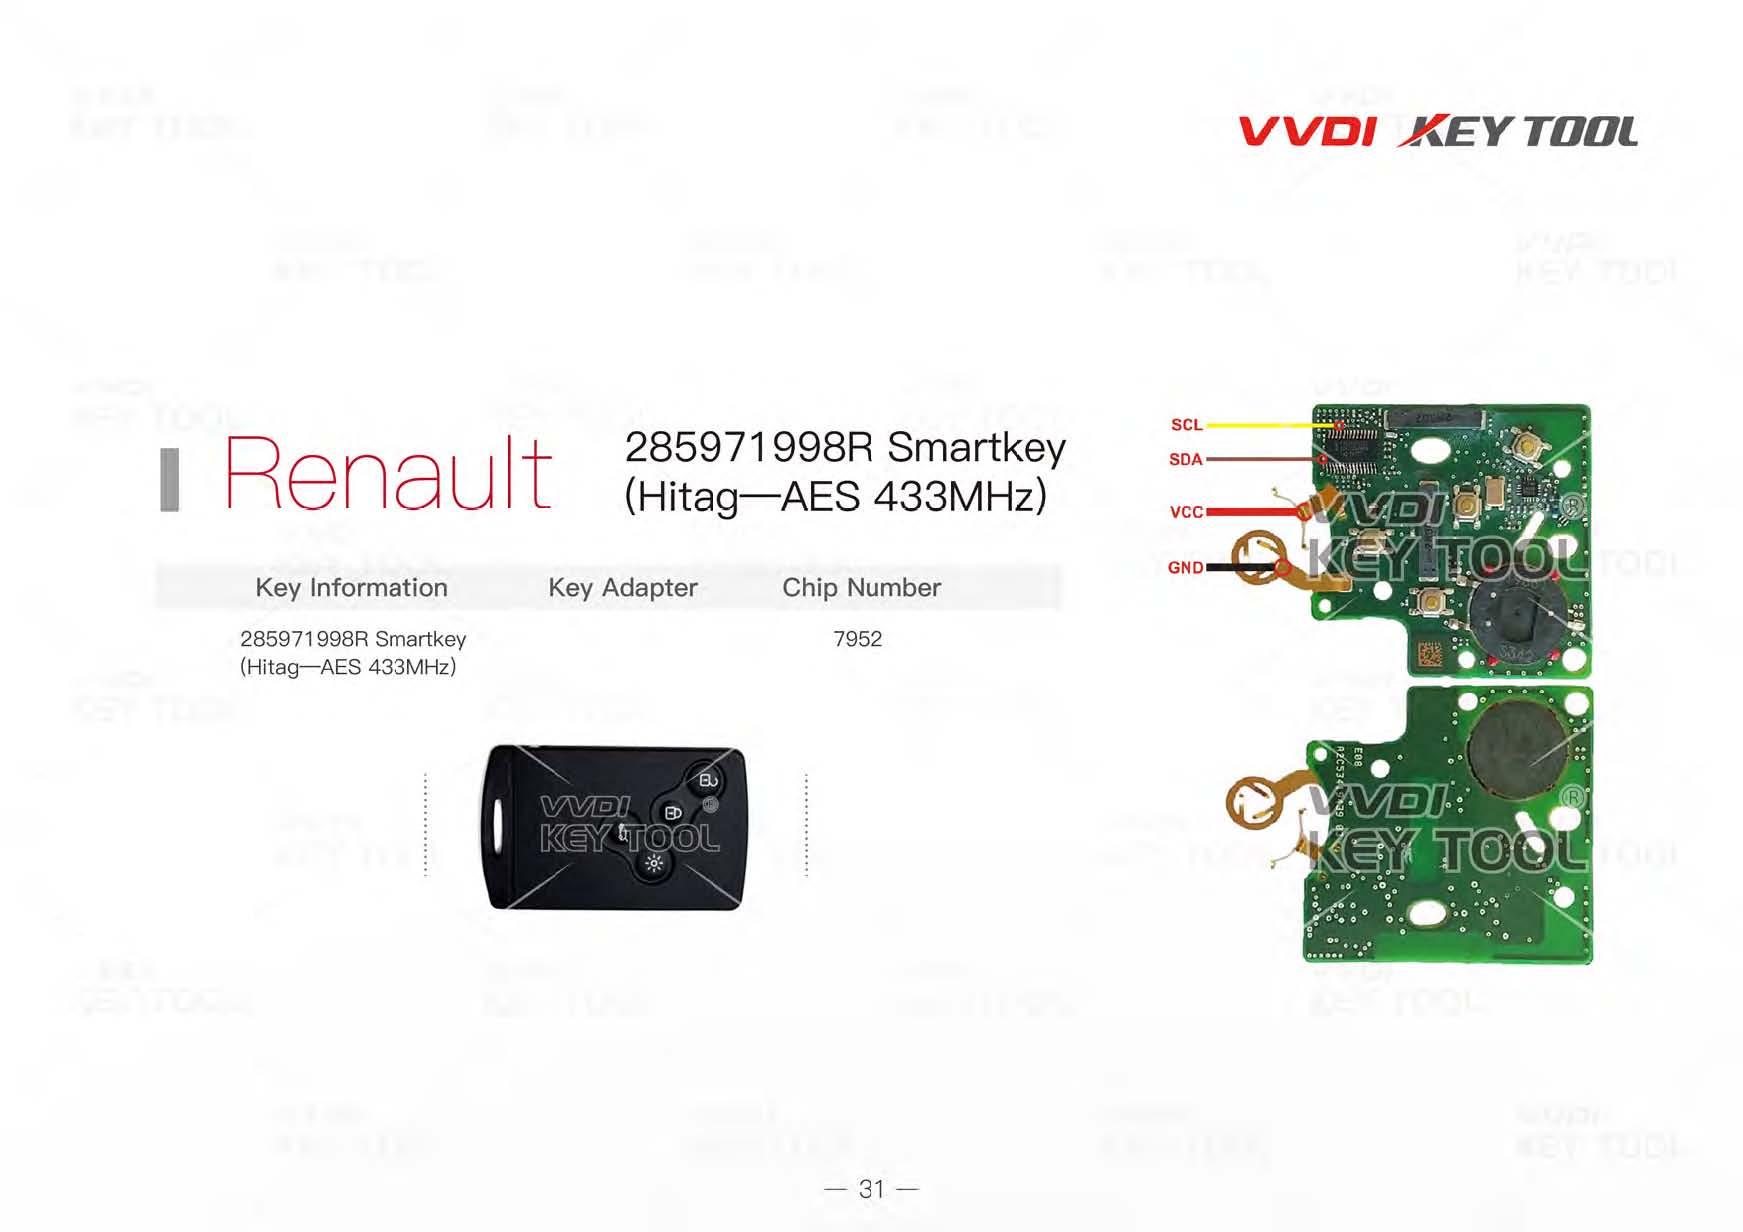 free wiring diagram tool yamaha aerox vvdi key remote unlock all here